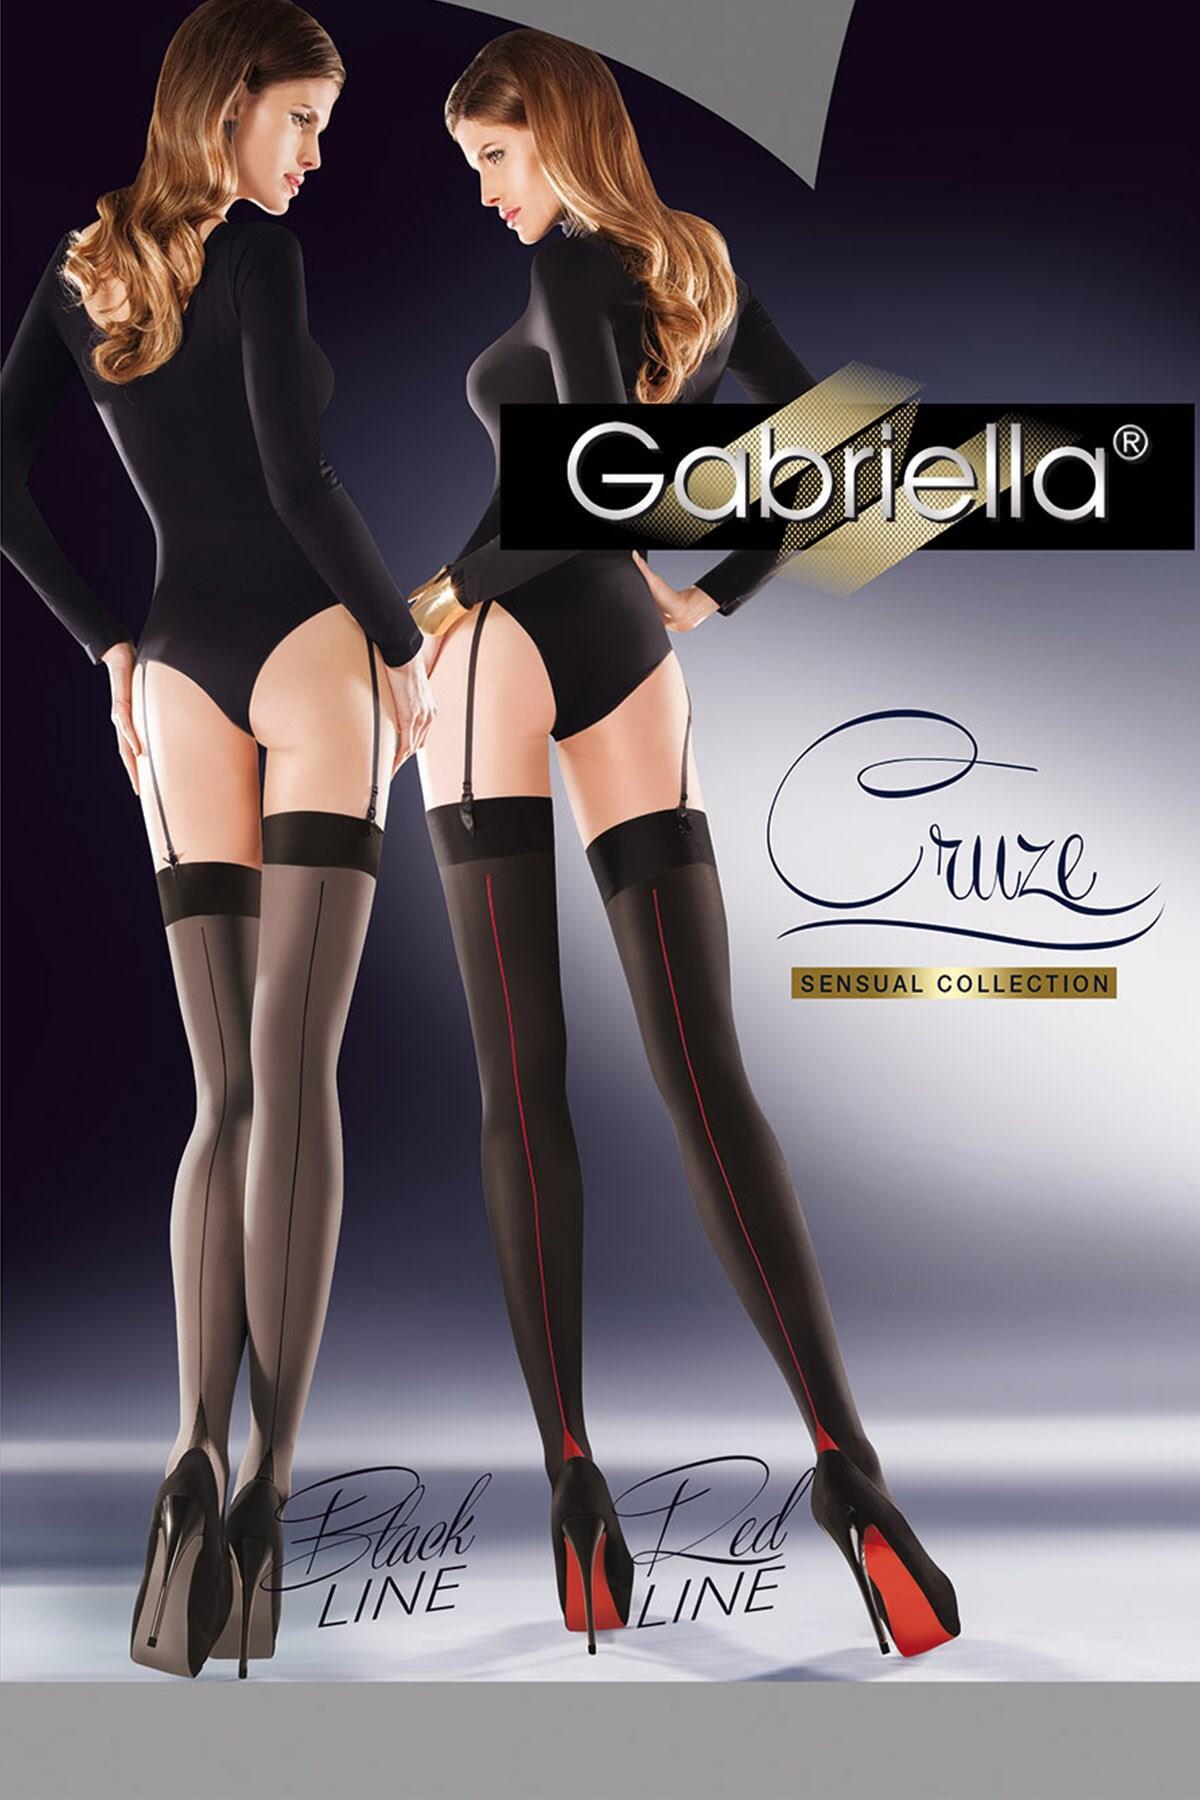 Gabriella-Cruze-Belt Stockings - Black/Red